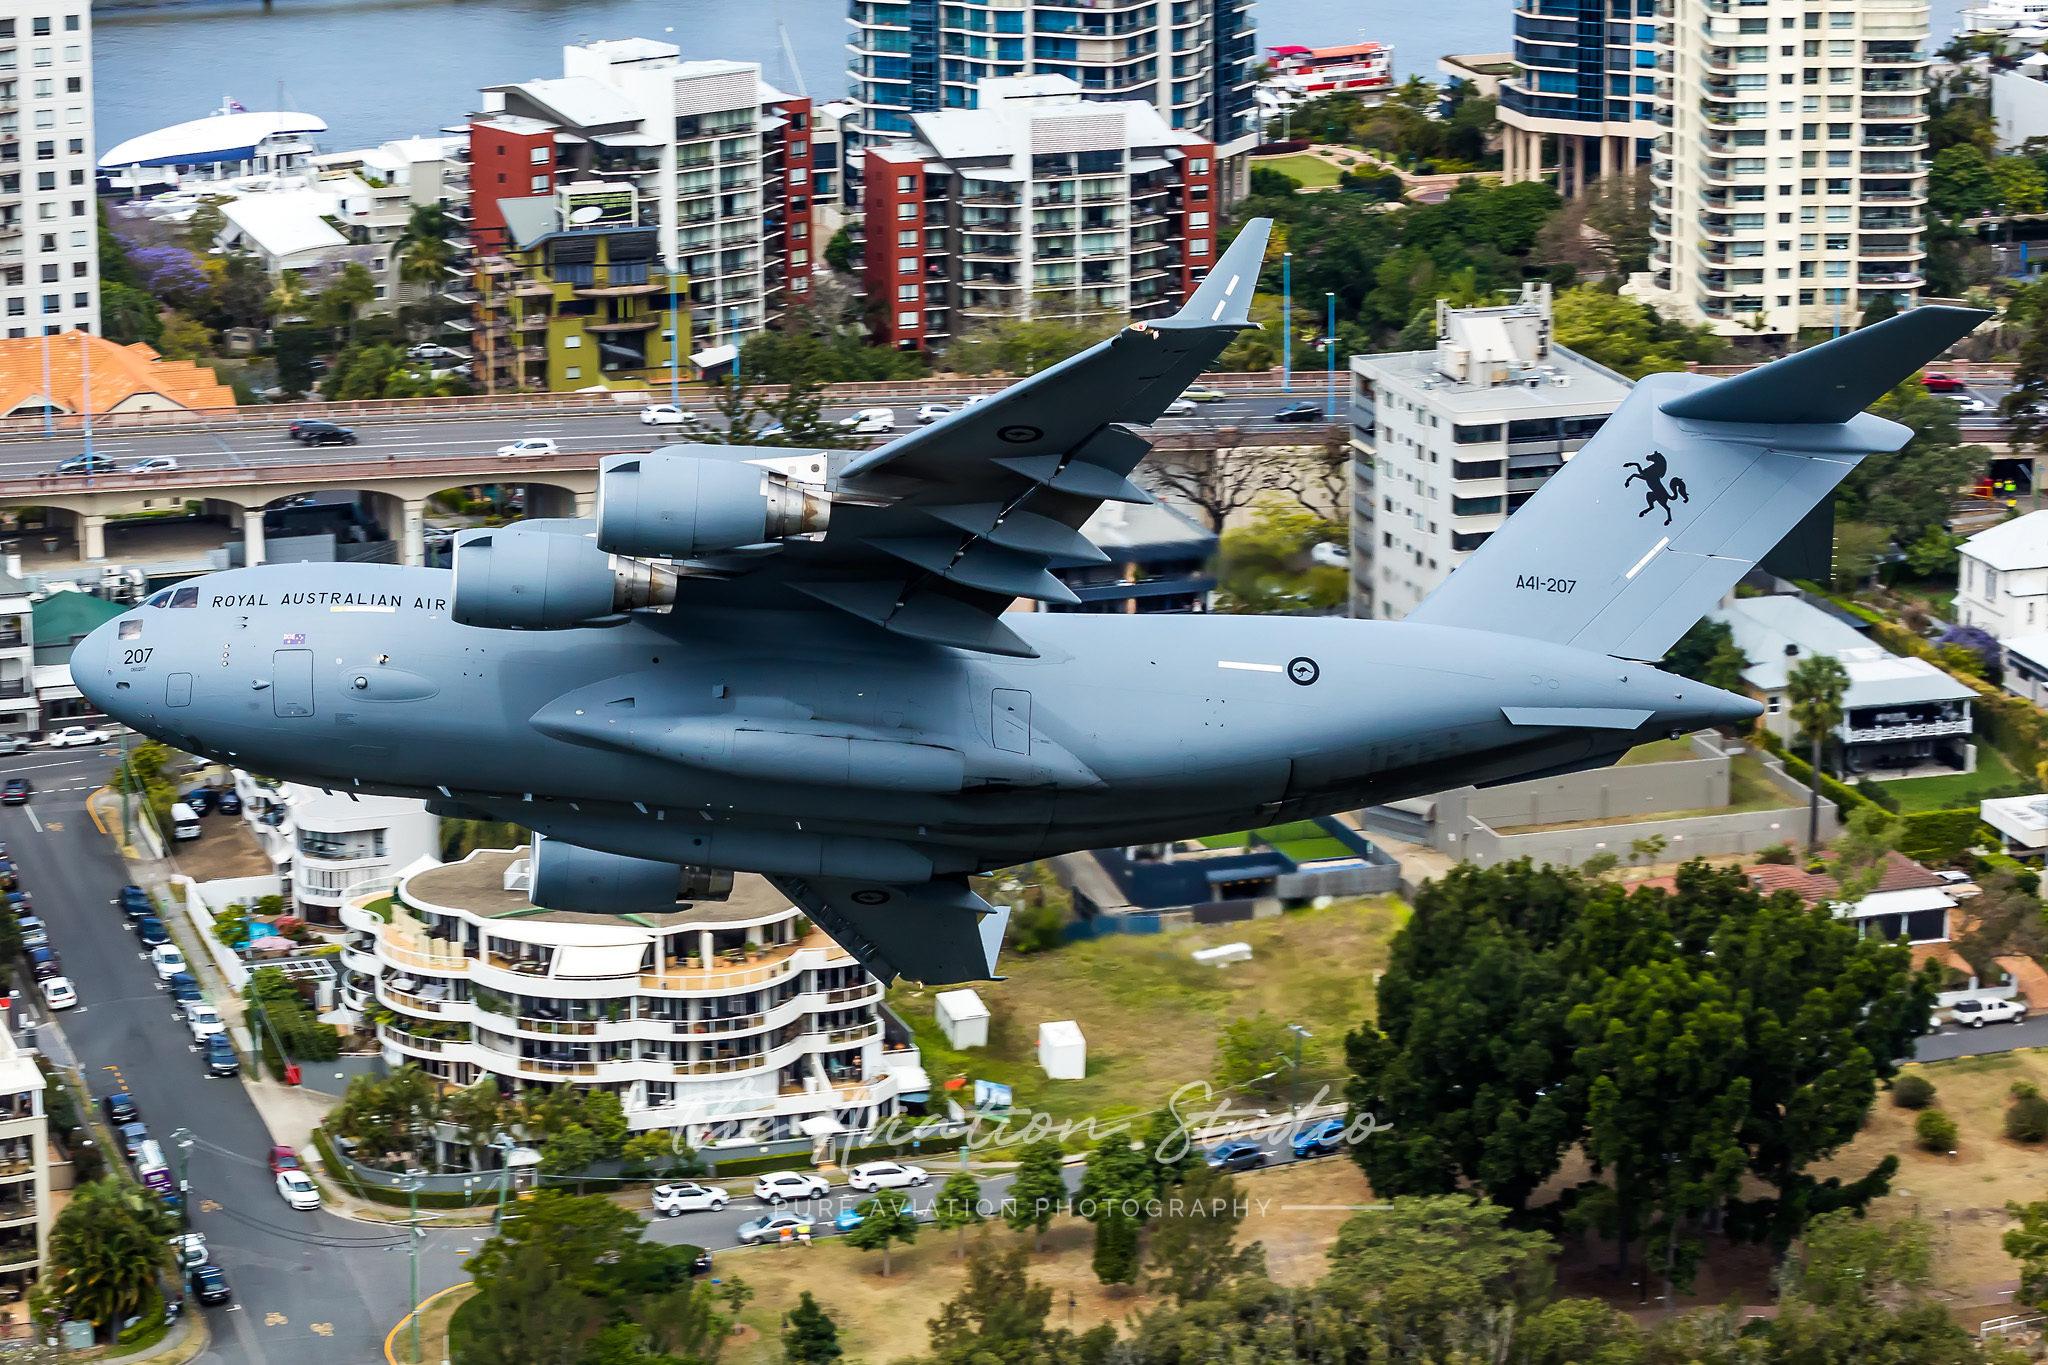 Riverfire RAAF Boeing C-17A Globemaster III A41-207 banking towards the Story Bridge